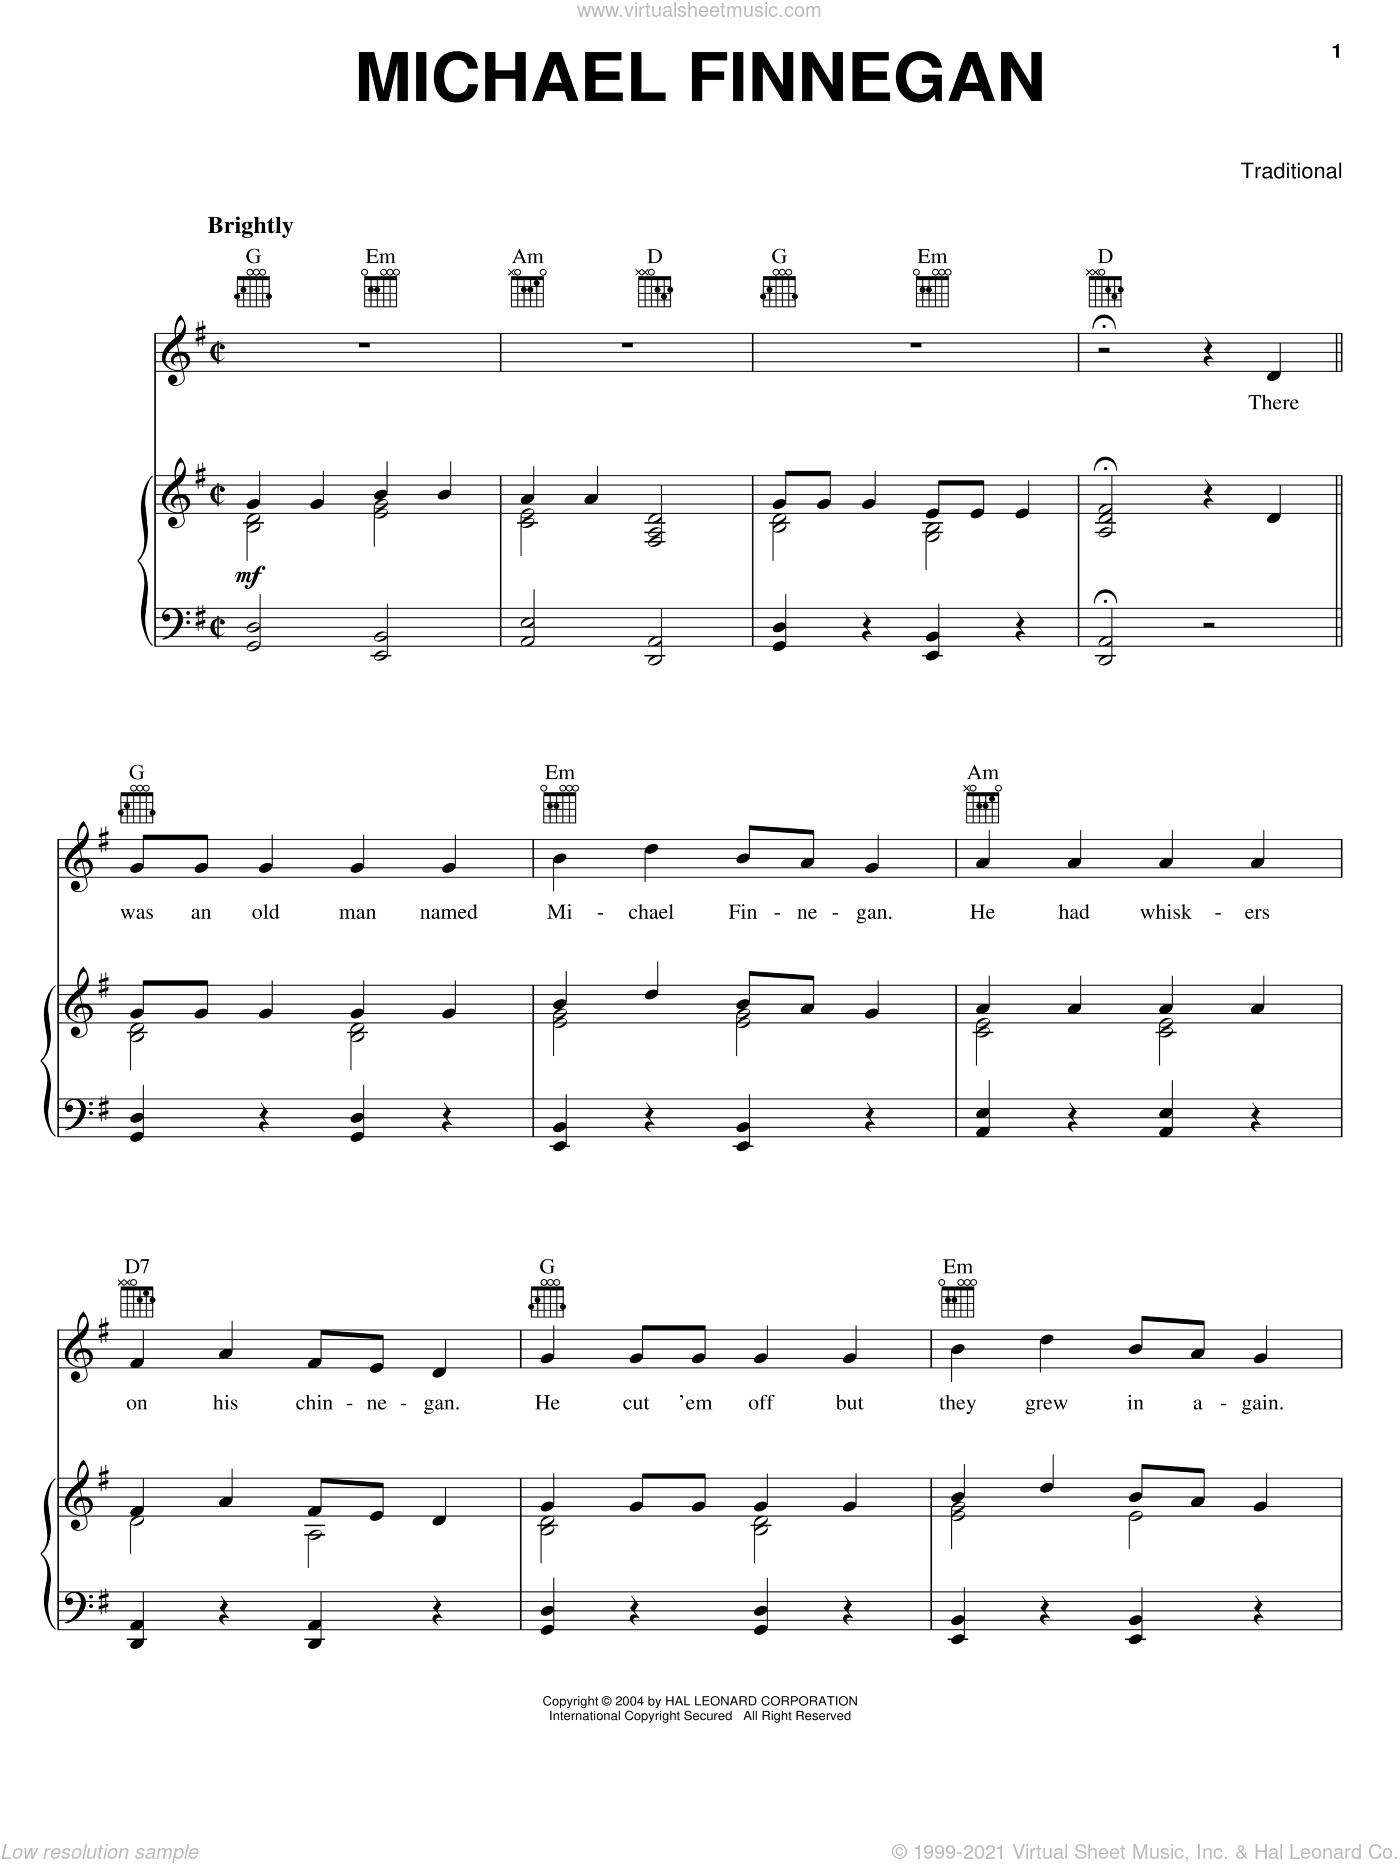 Michael Finnegan sheet music for voice, piano or guitar, intermediate skill level